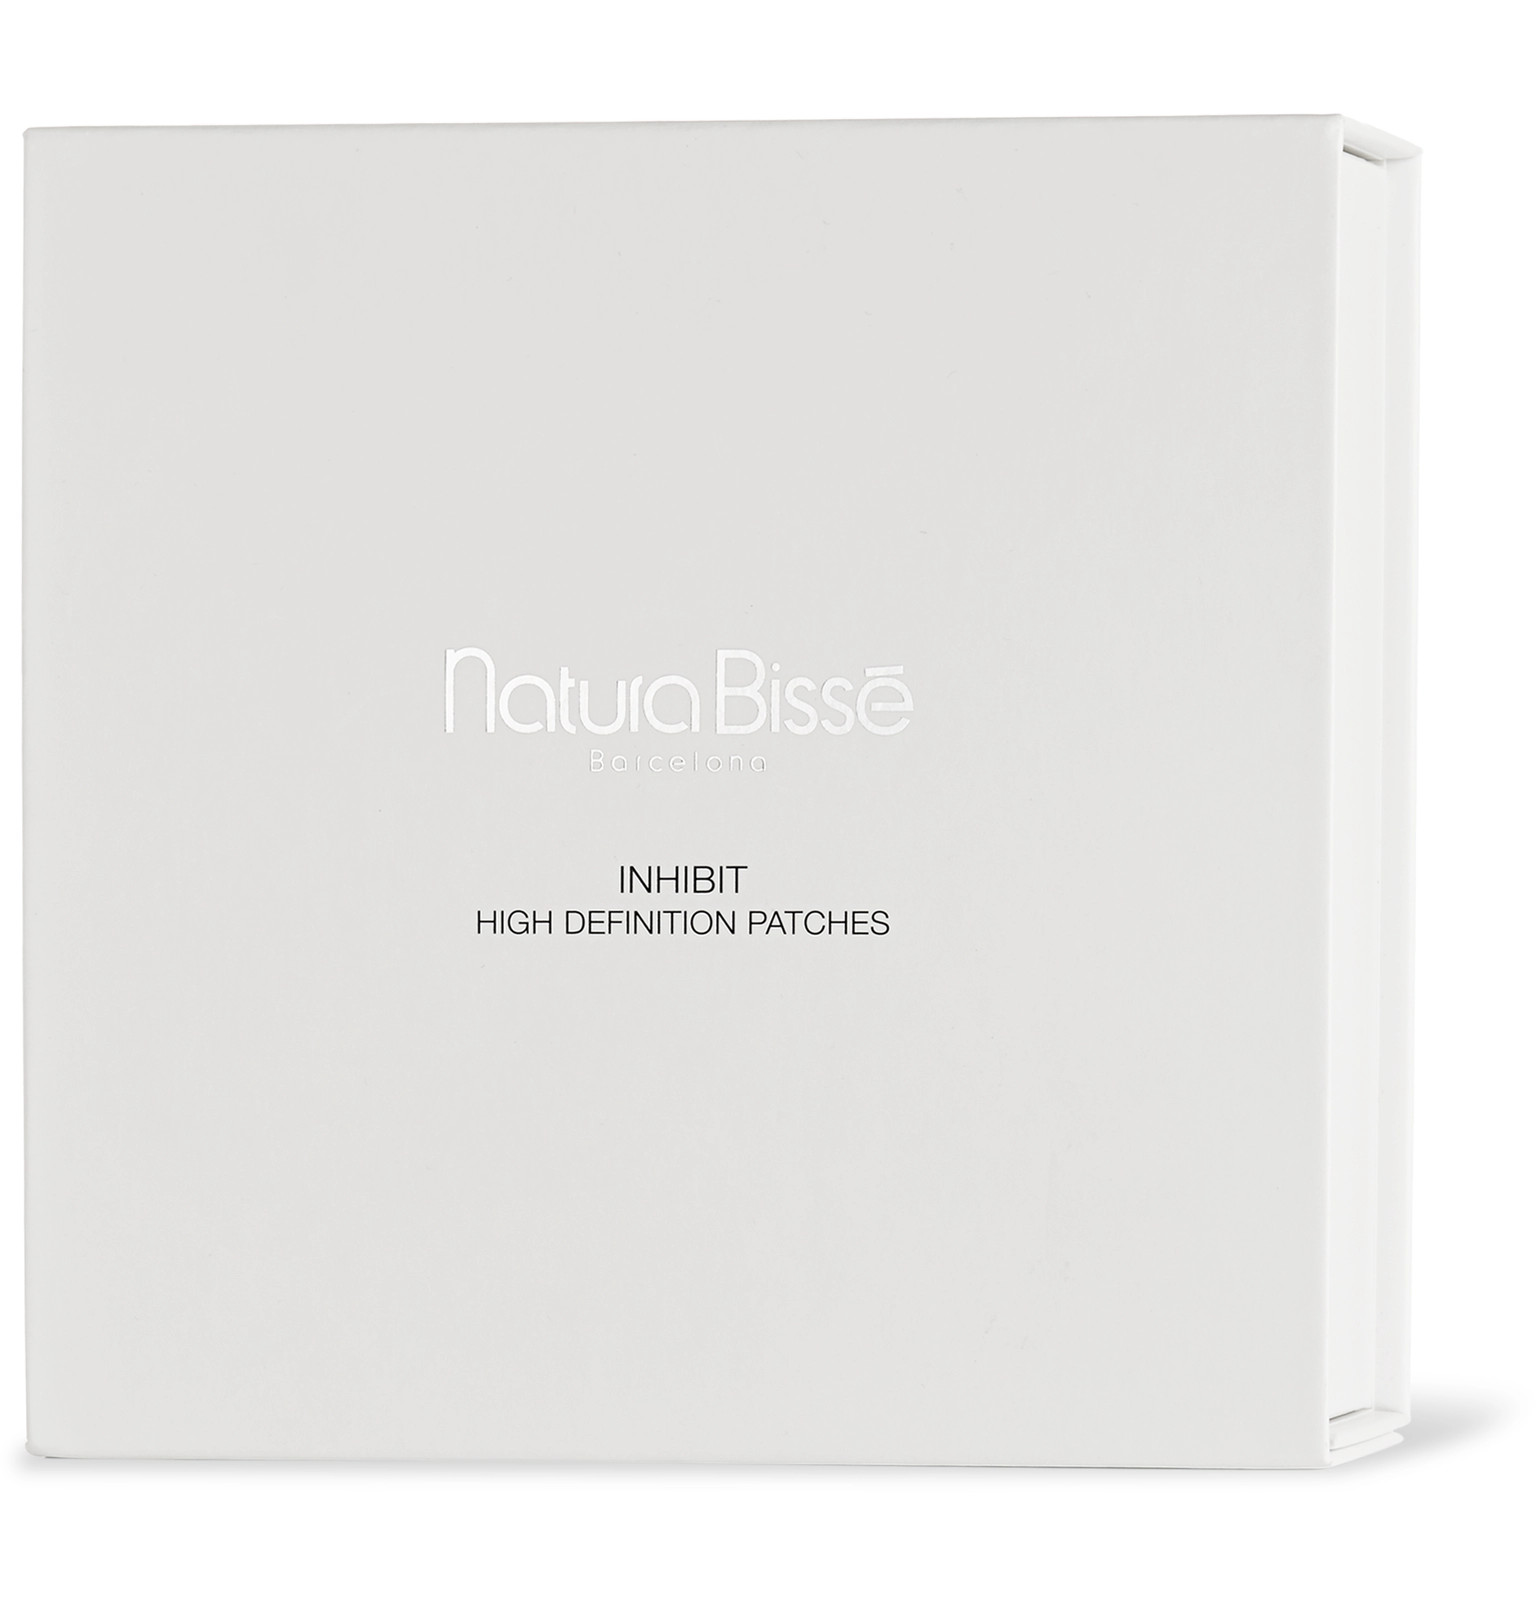 natura bissé - inhibit high definition patches x 4